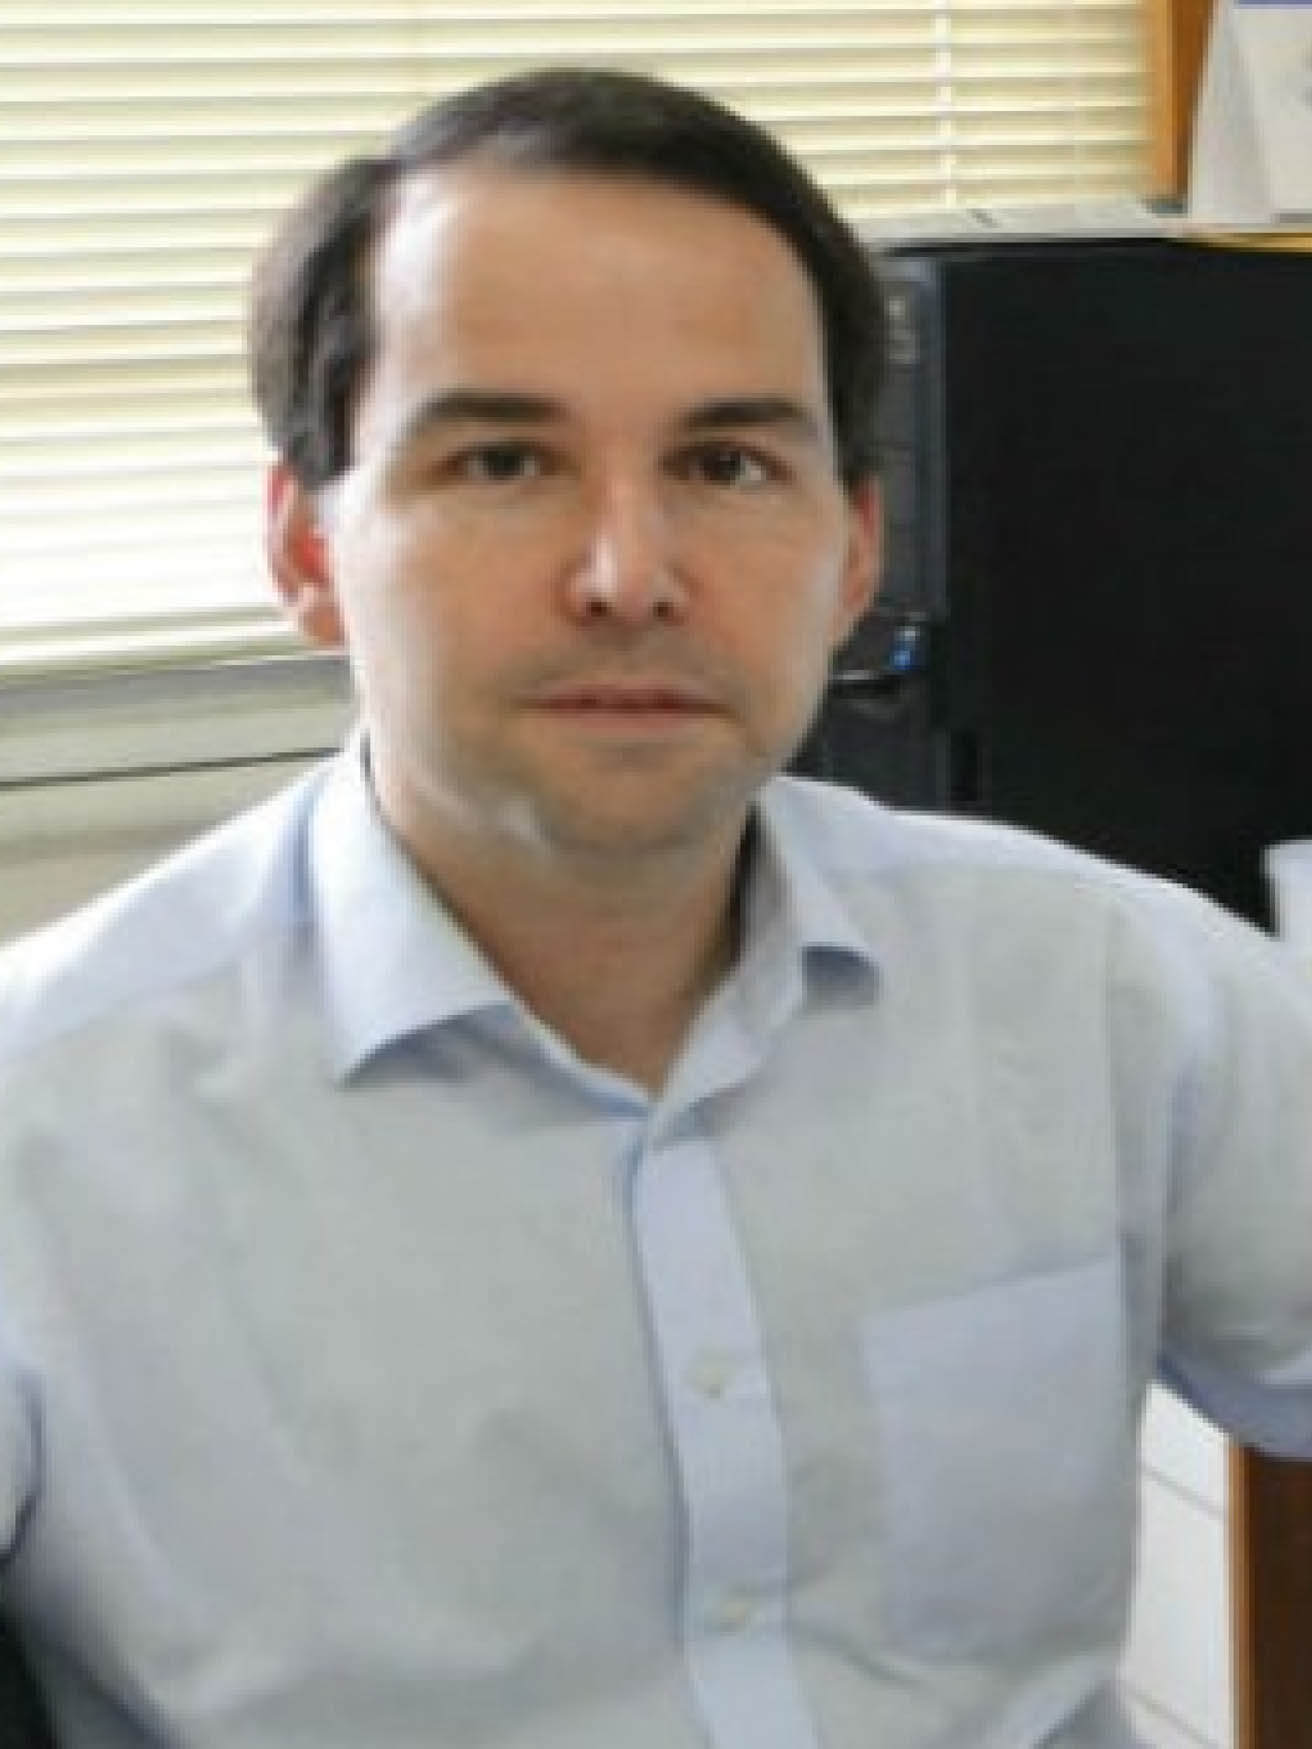 RODRIGO CAIADO DE LAMARE